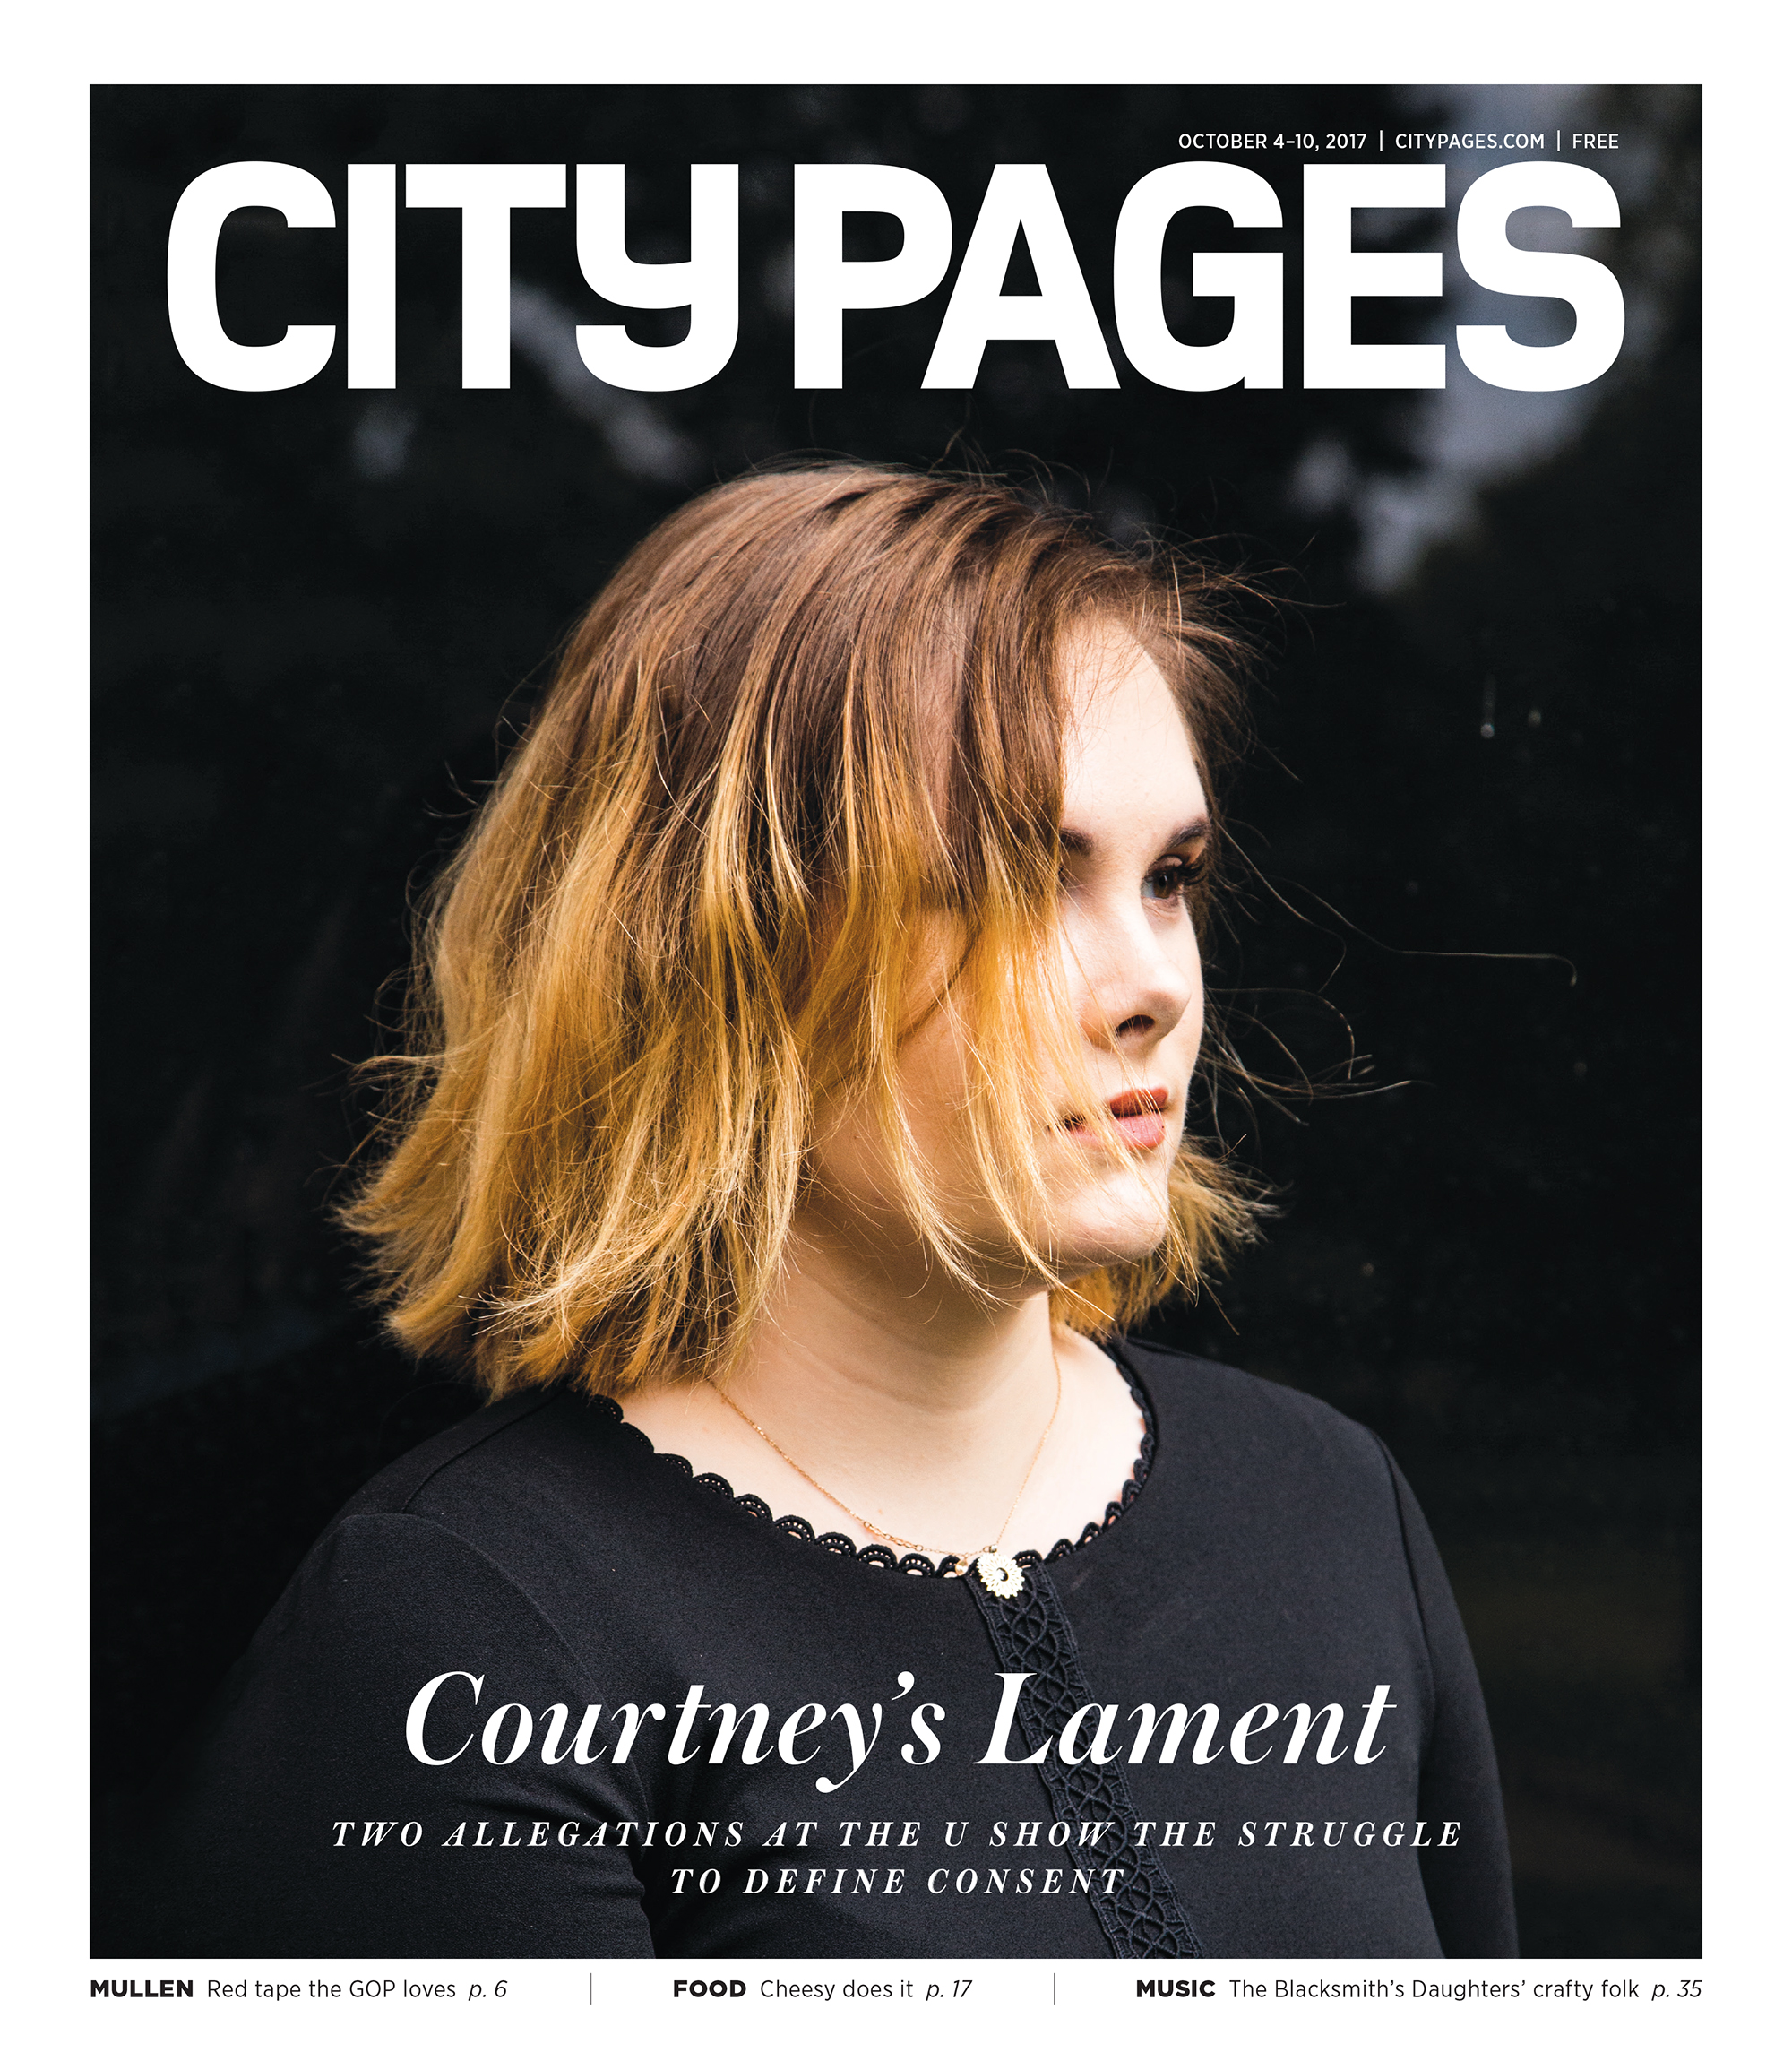 ctyp_news_CourtneysLament_cover_crSarahWhite.jpg